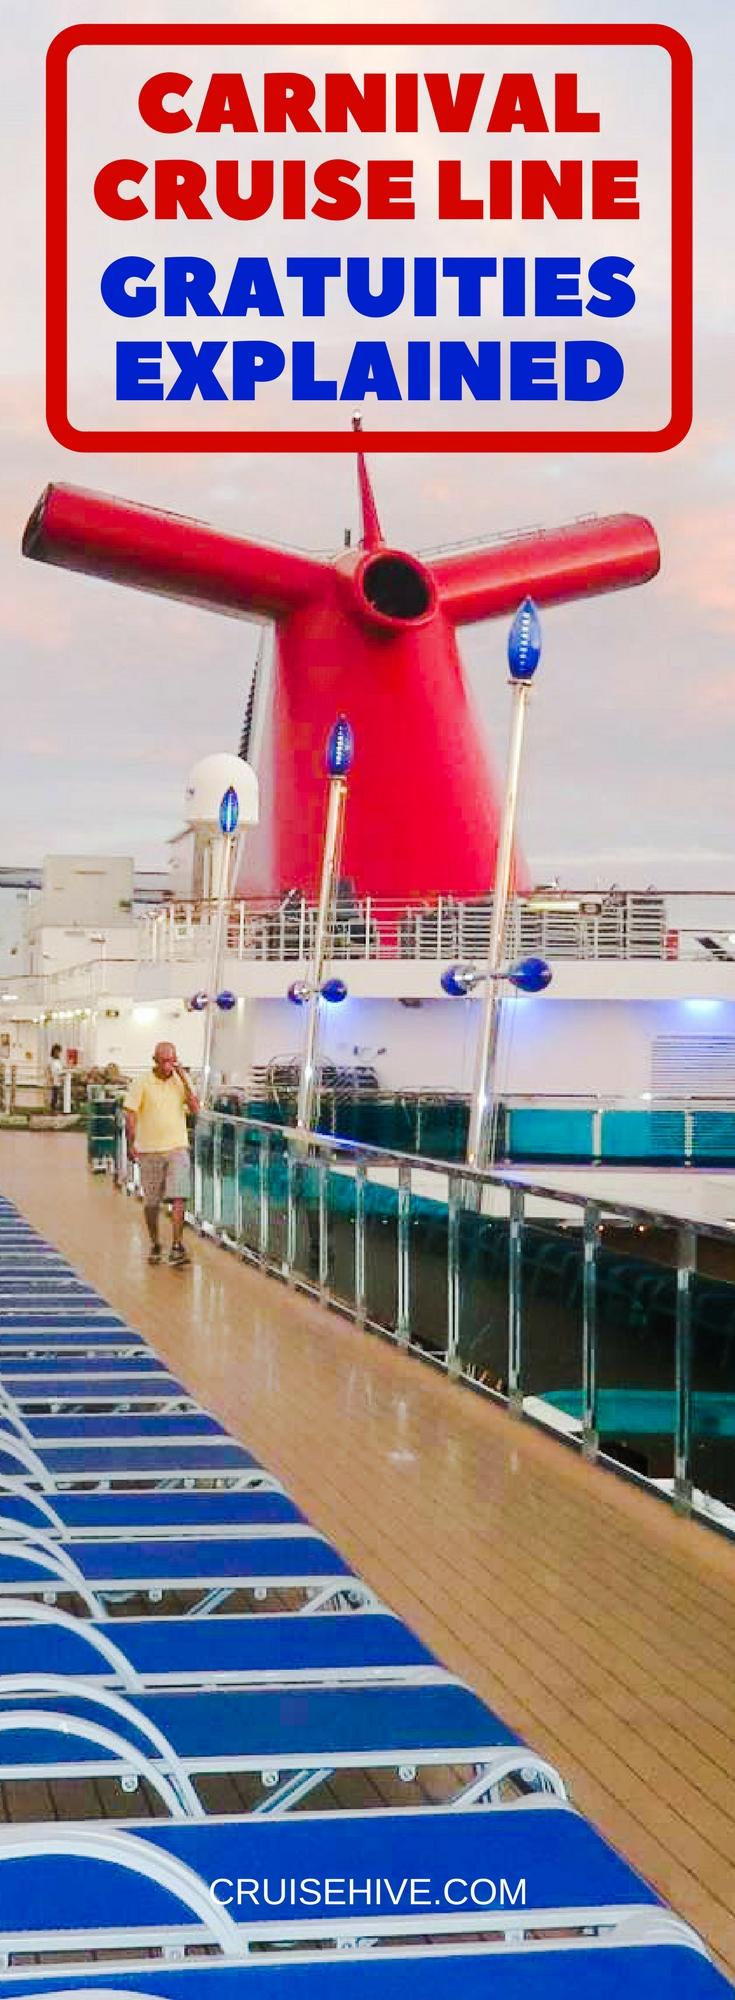 Carnival Cruise Line Gratuities